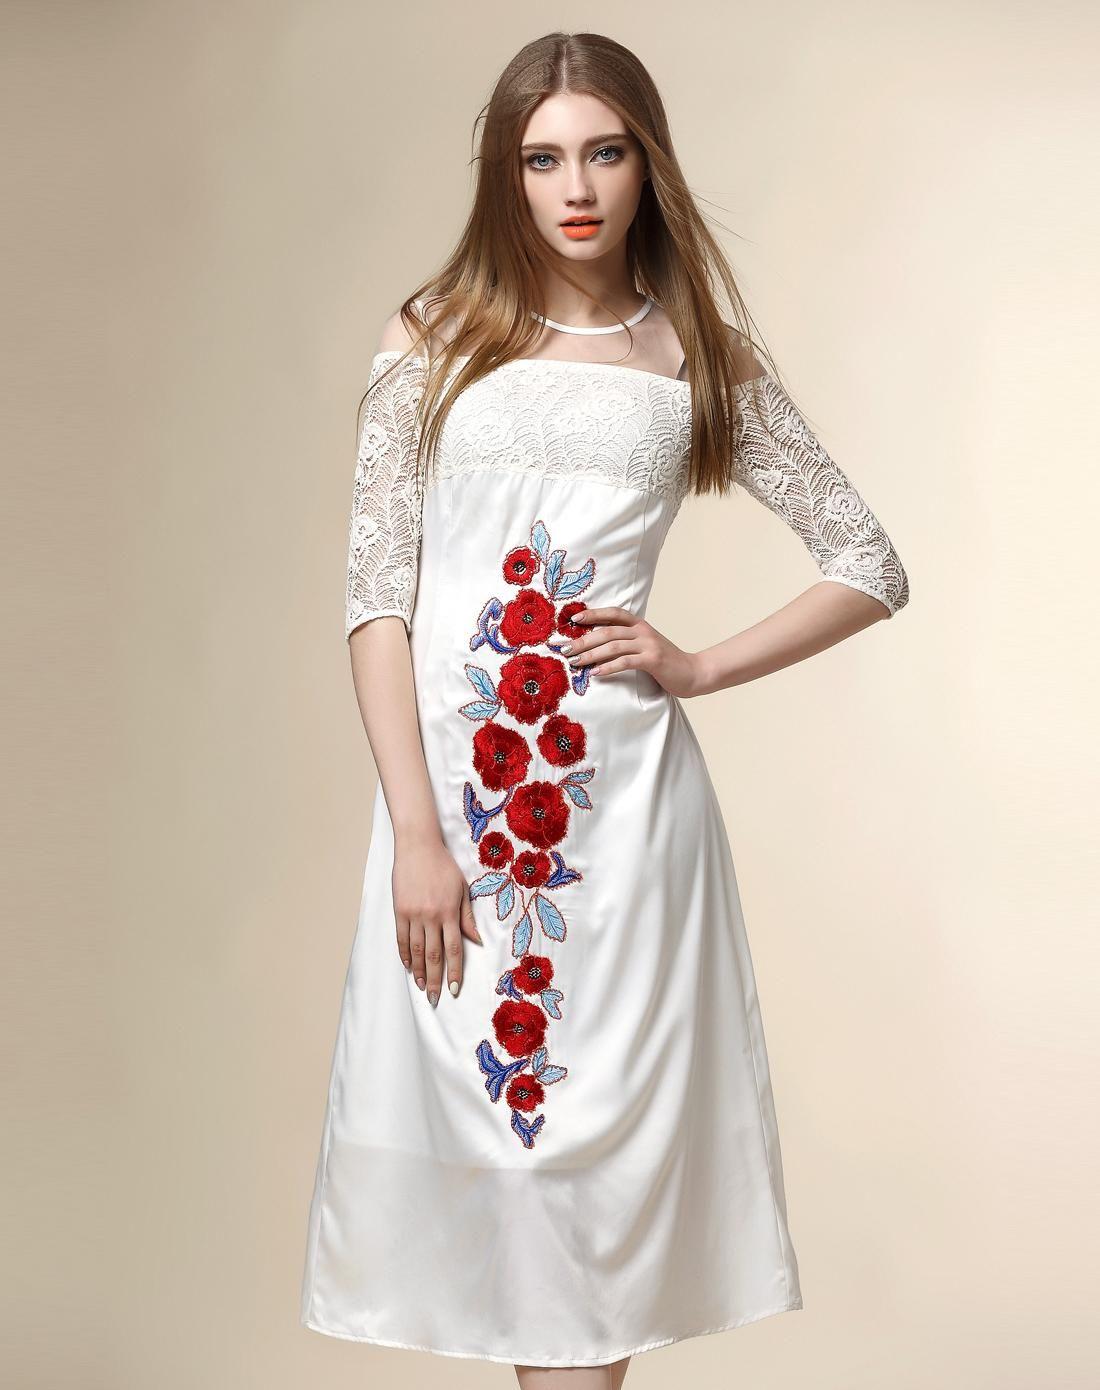 #AdoreWe #VIPme Party Dresses - Nexiia White Lace Embroidery Yoke Feminine Midi Dress - AdoreWe.com